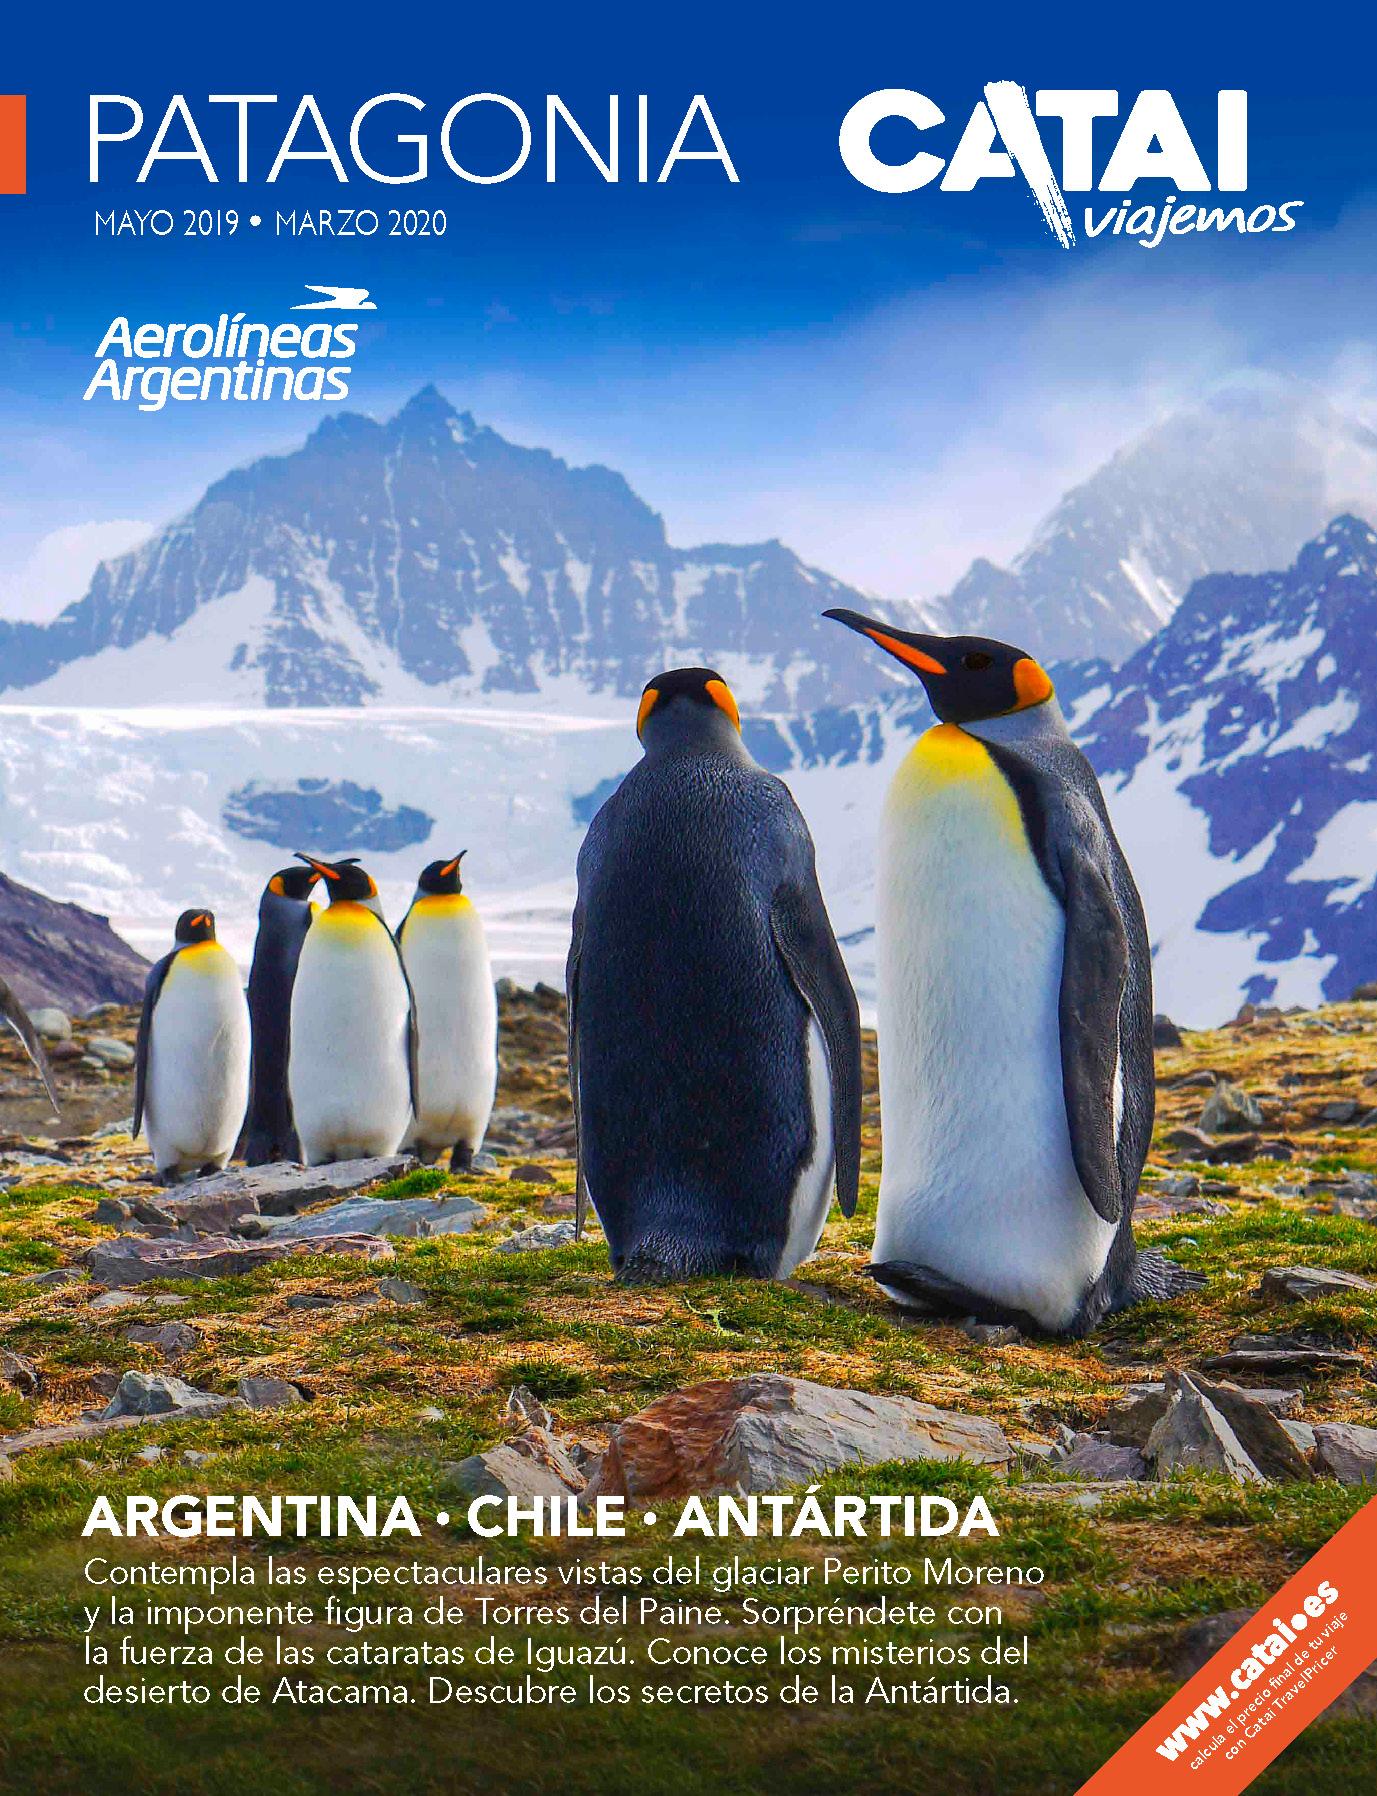 Catalogo Catai Patagonia 2019-2020